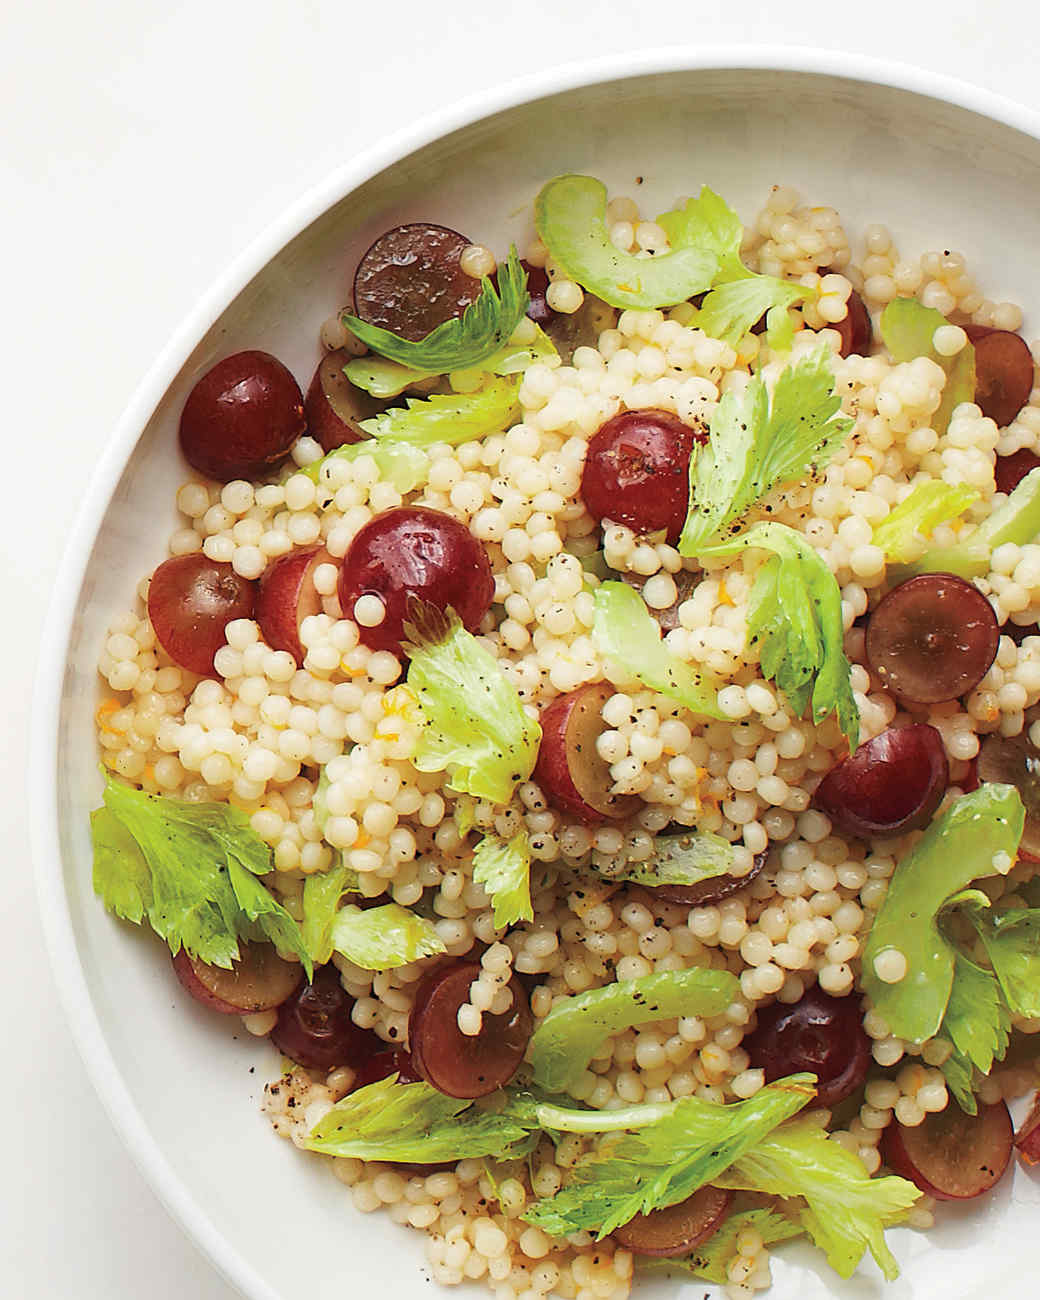 grape-celery-couscous-salad-med109135_vert.jpg